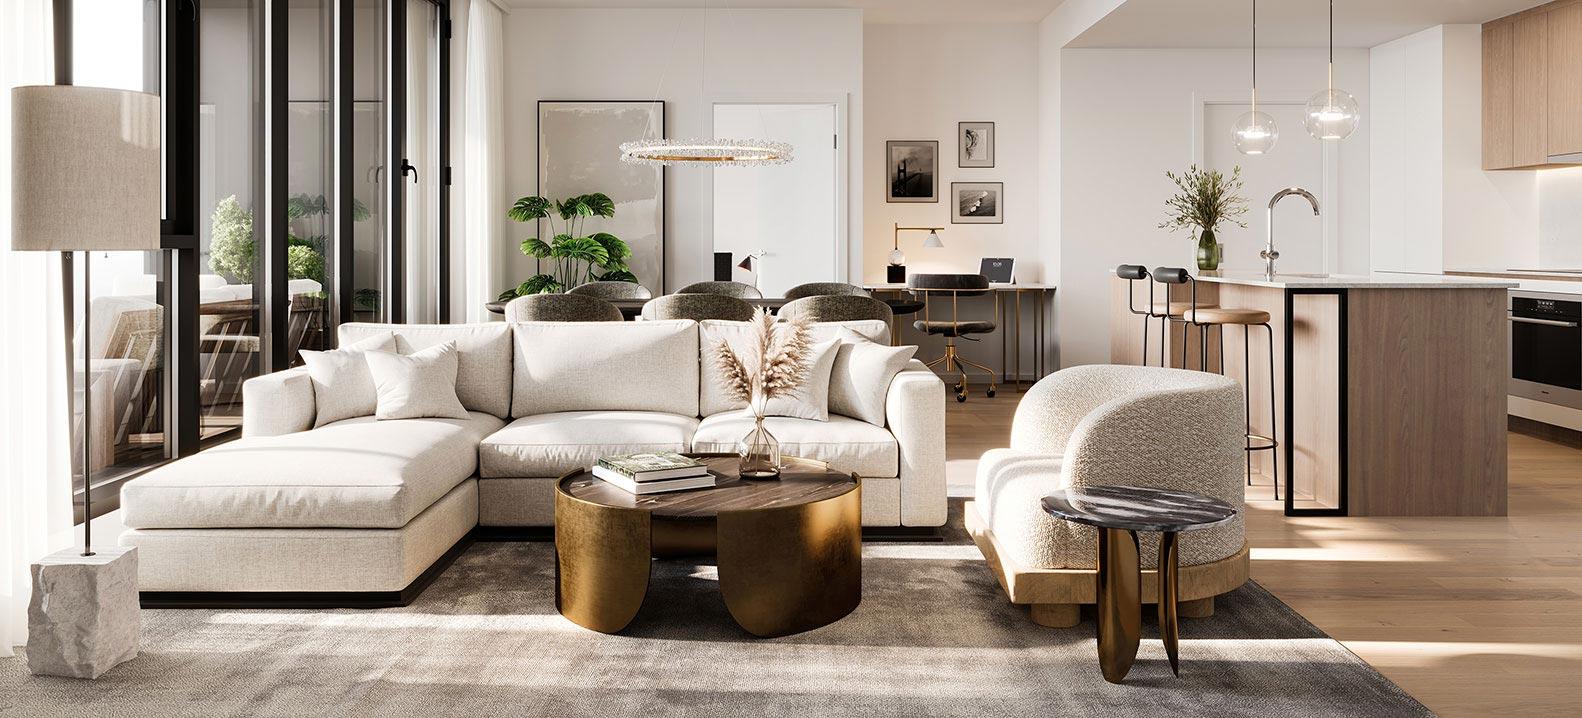 Oria Condominiums - Salon exécutif